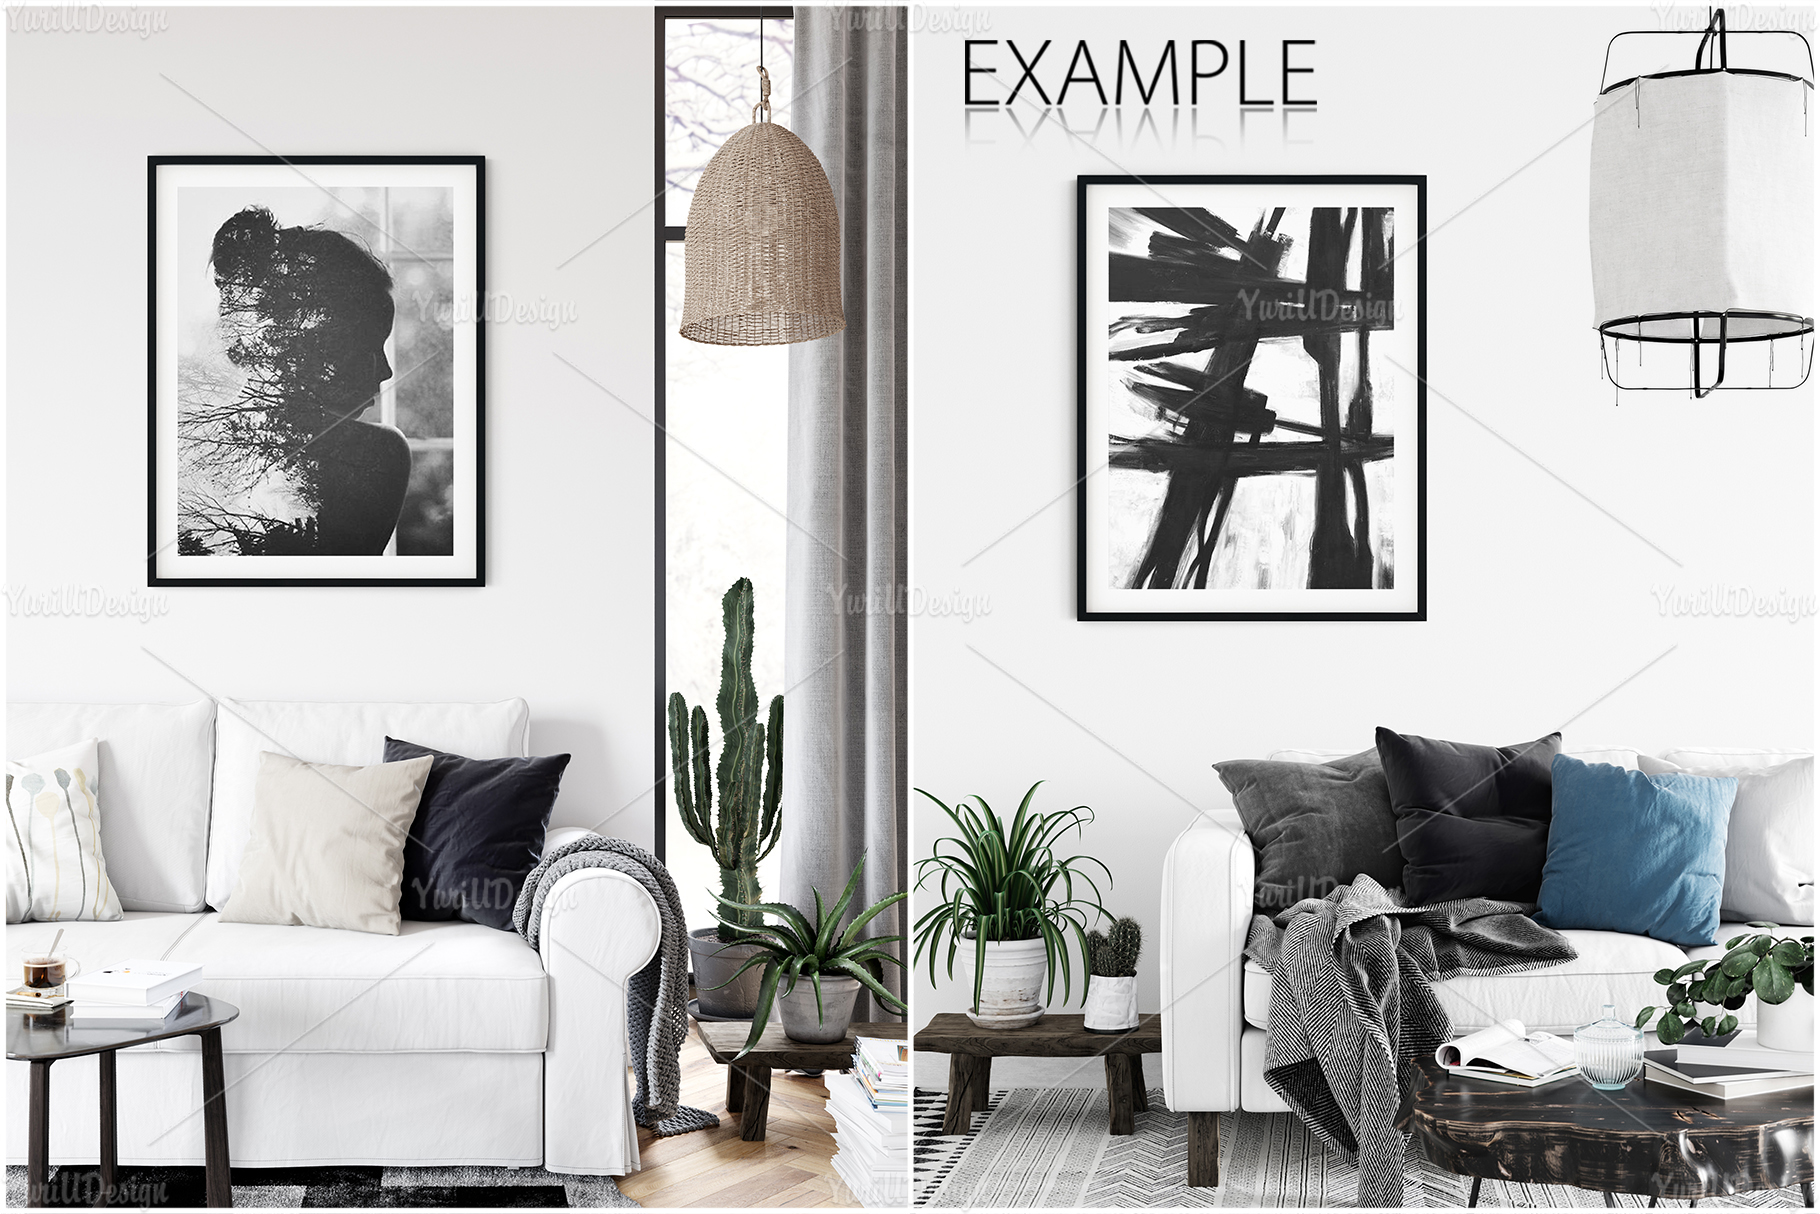 Scandinavian Interior Frames & Walls Mockup Bundle - 3 example image 27